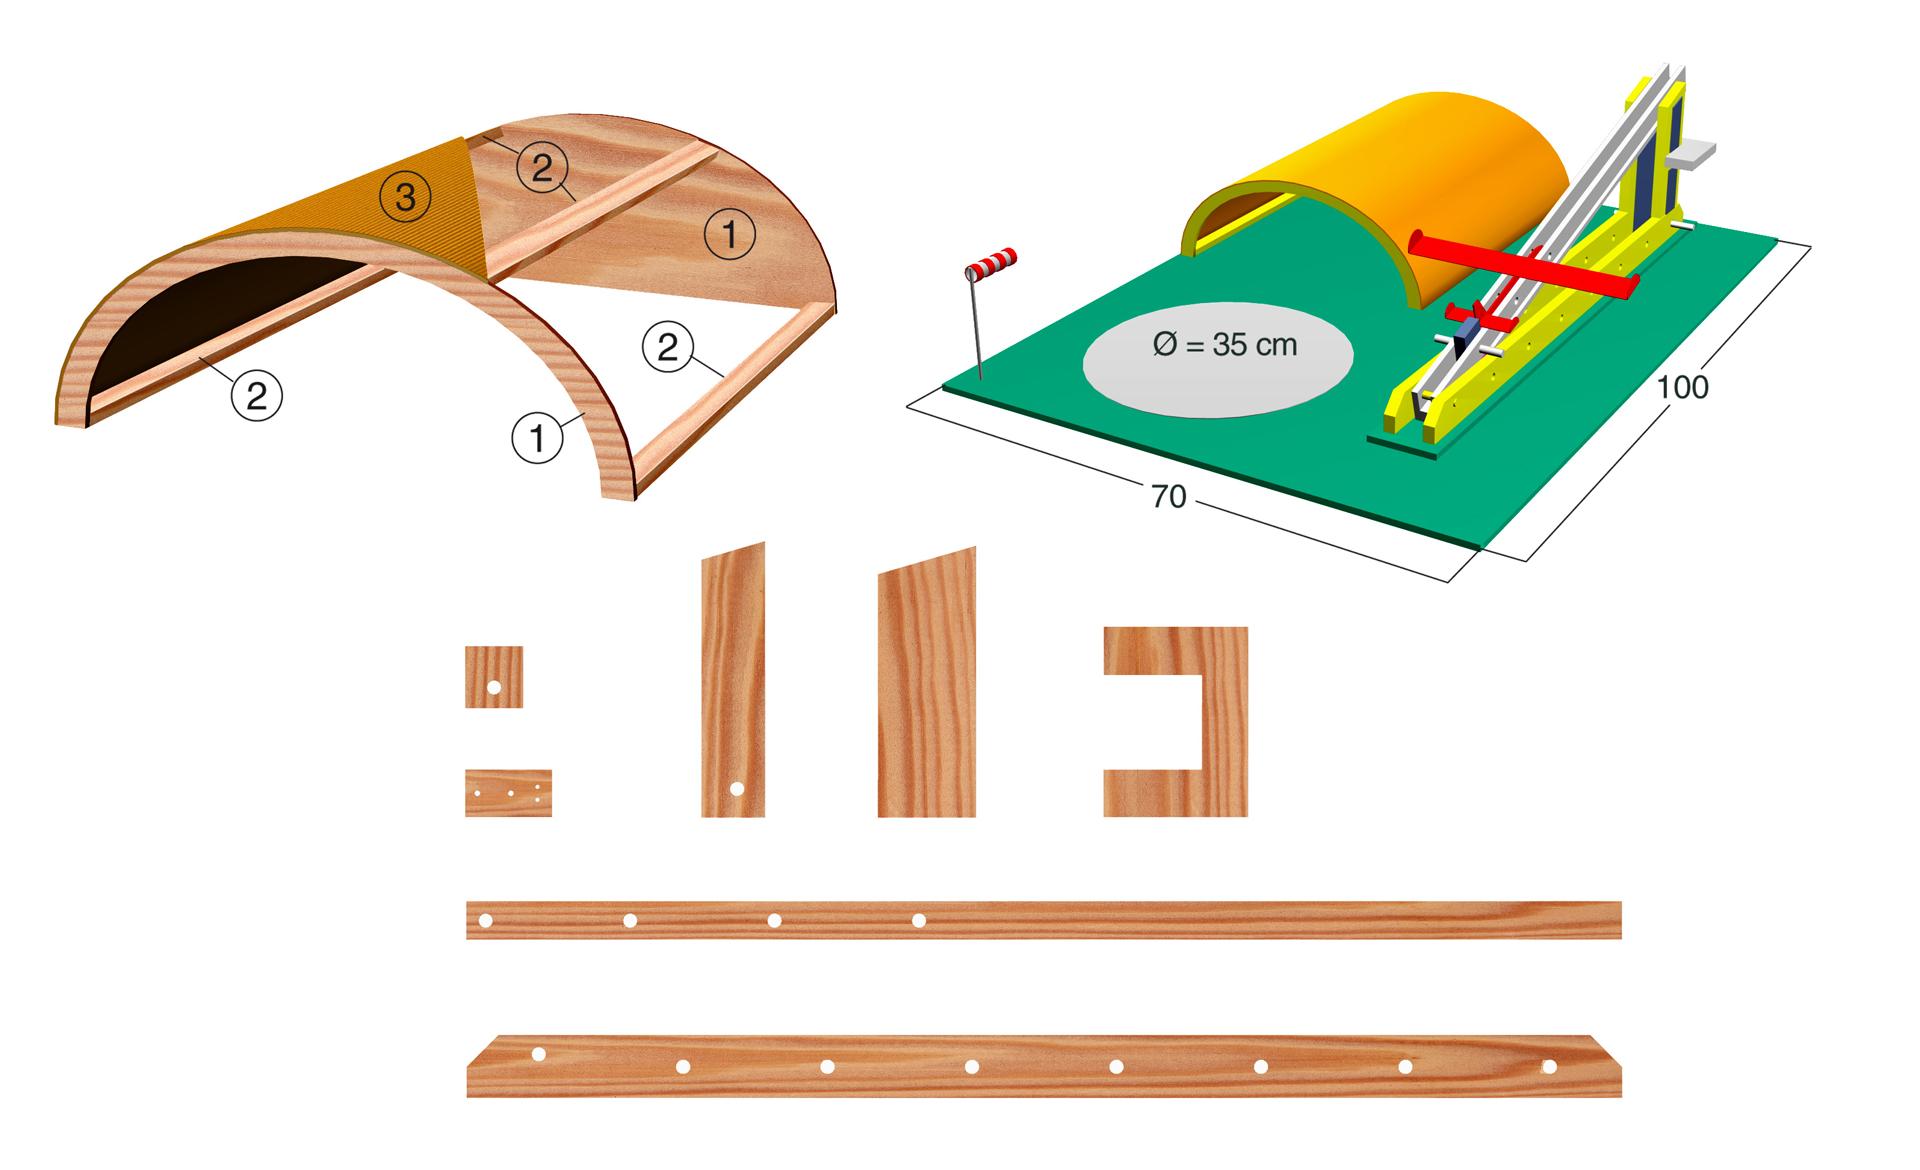 flugzeug basteln spielzeug spielger te bild 10. Black Bedroom Furniture Sets. Home Design Ideas